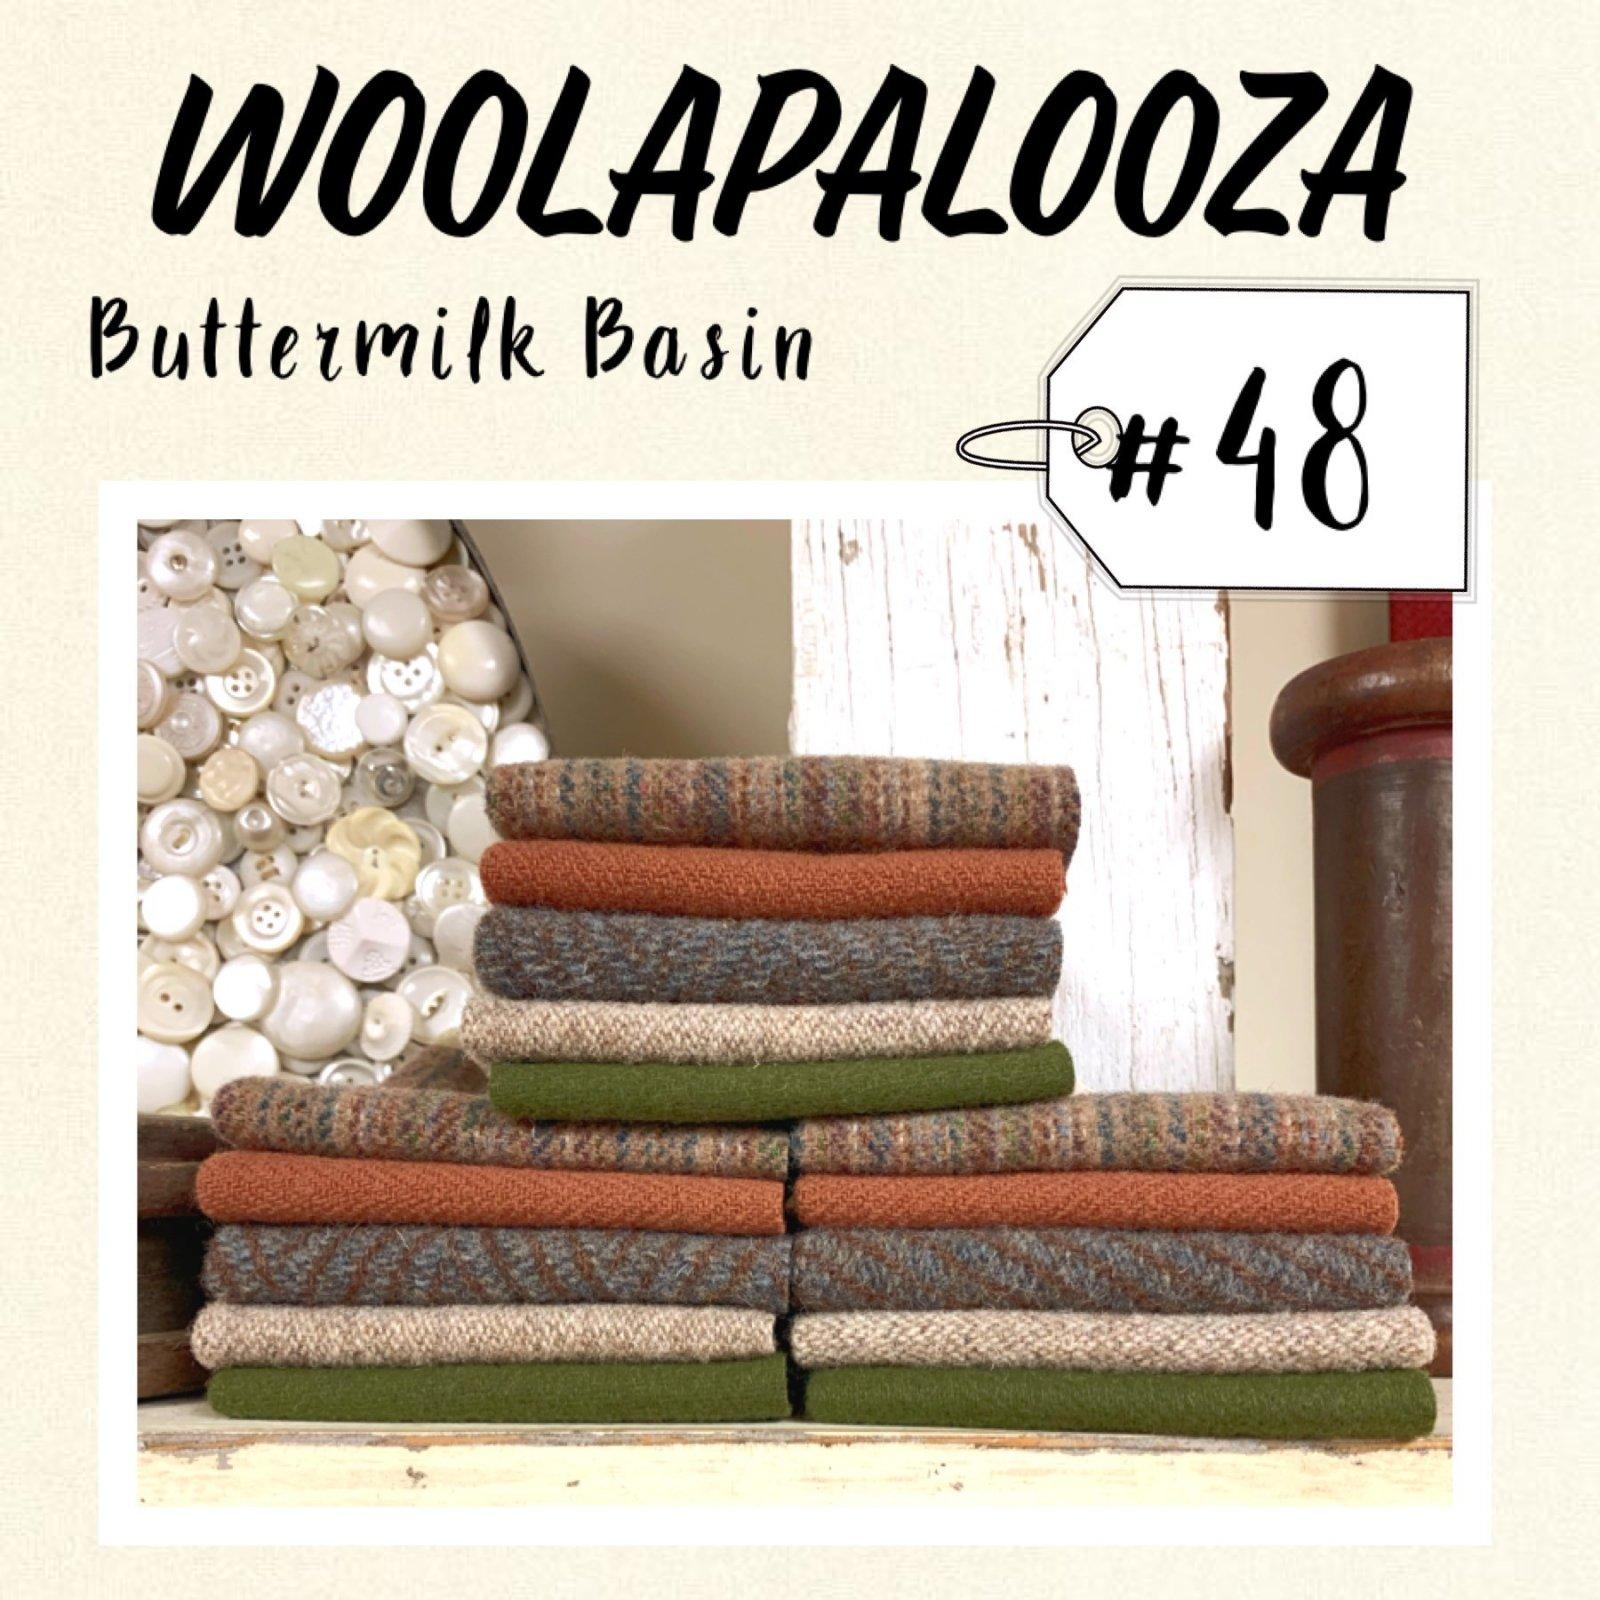 Woolapalooza #48 Wool Bundle